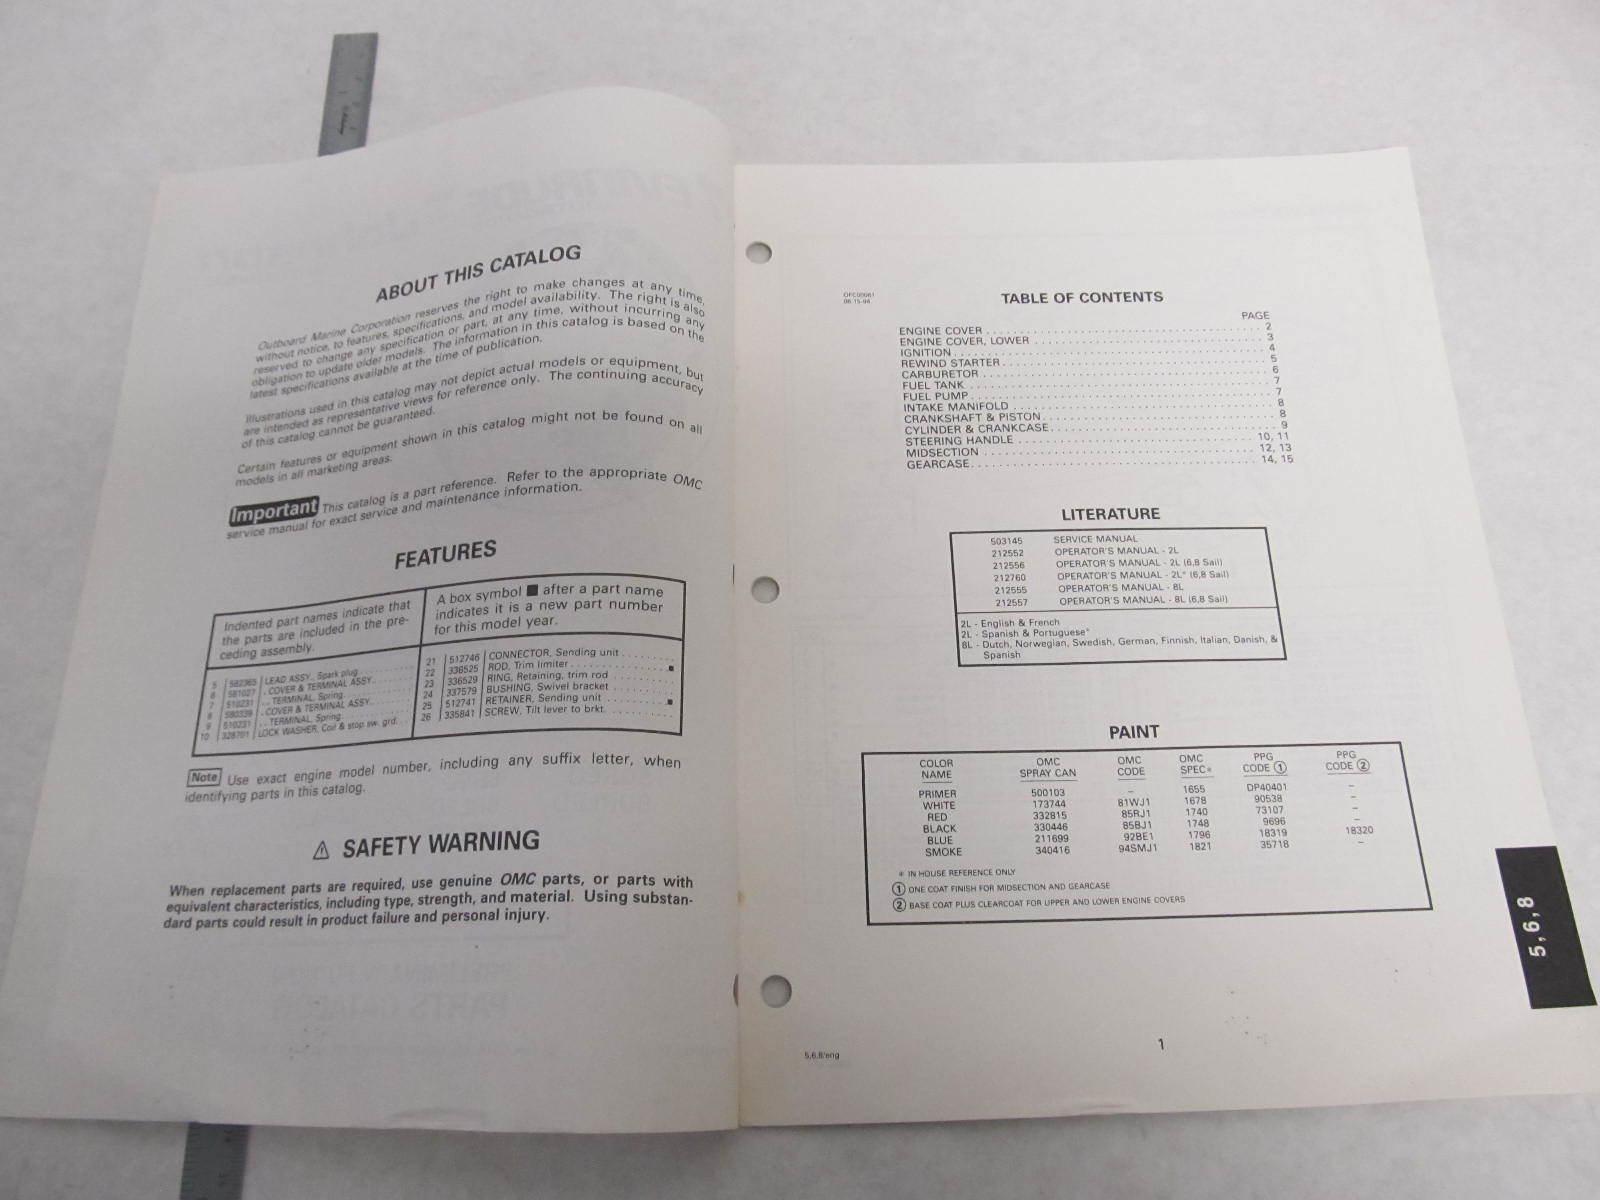 1995 Evinrude Johnson Outboard Parts Catalog 5-8 HP